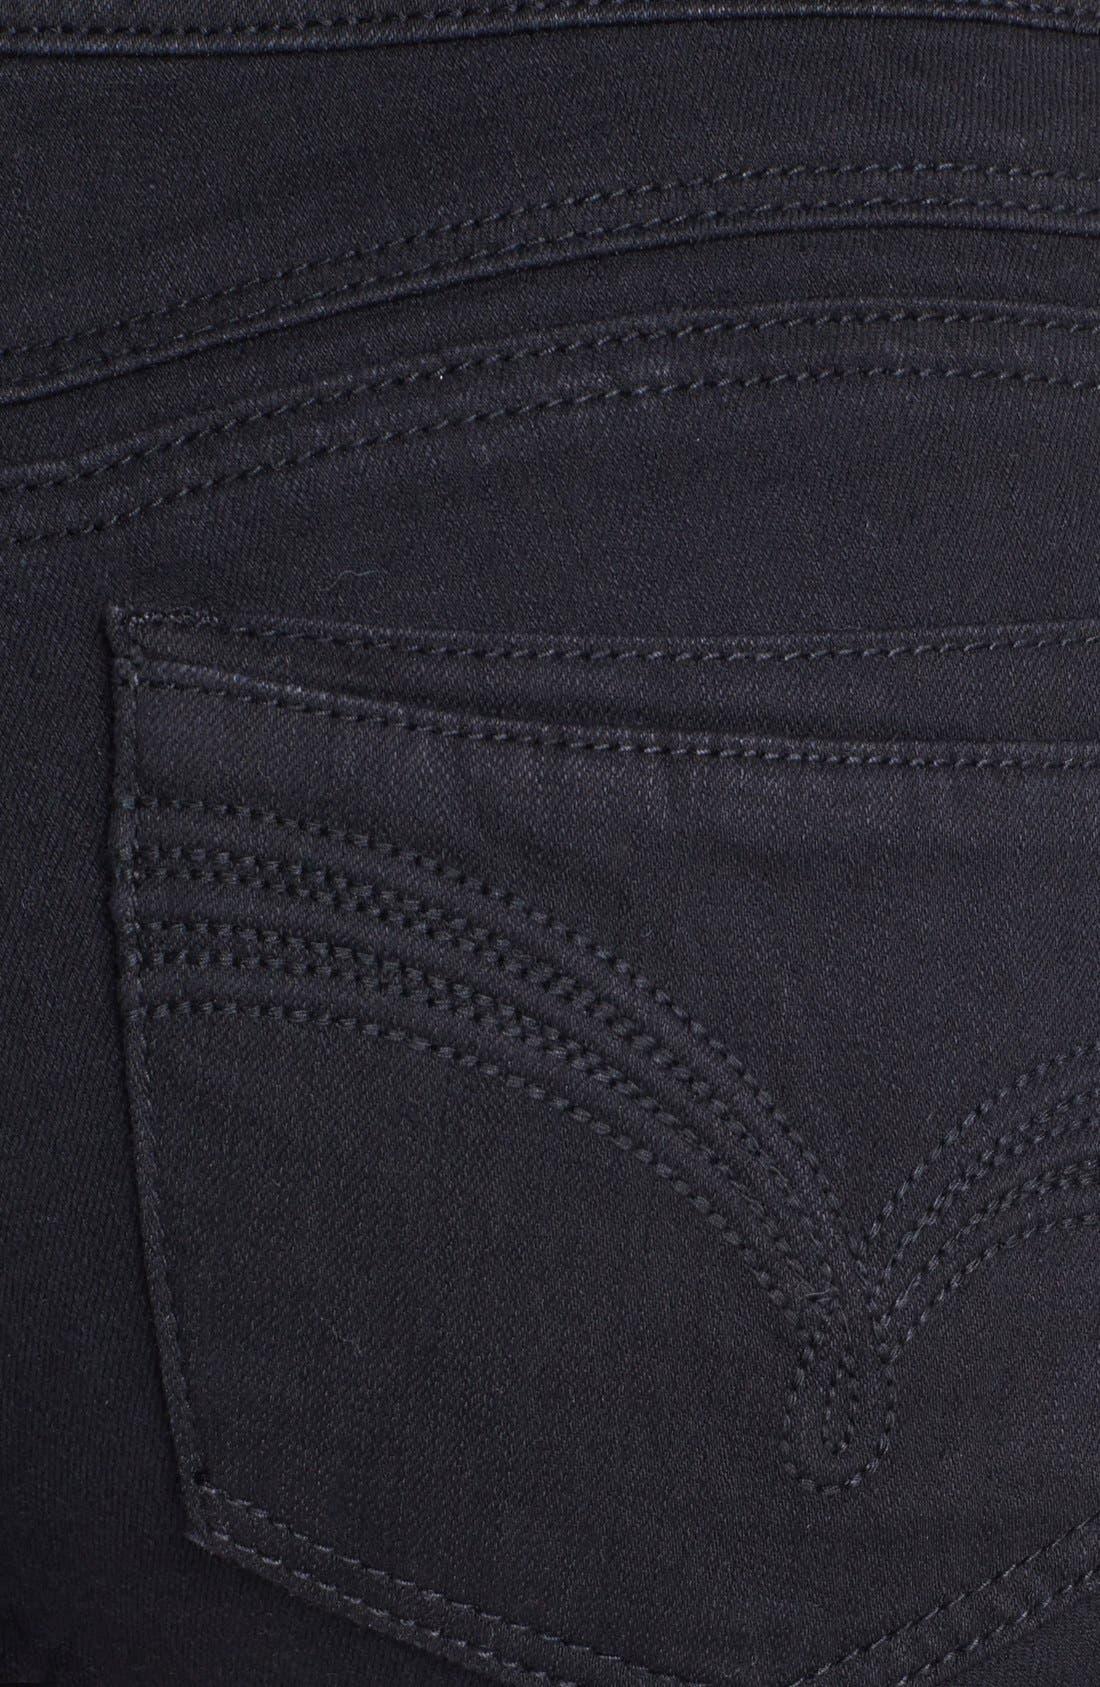 Alternate Image 3  - Jolt Stretch Bootcut Jeans (Black) (Juniors) (Online Only)